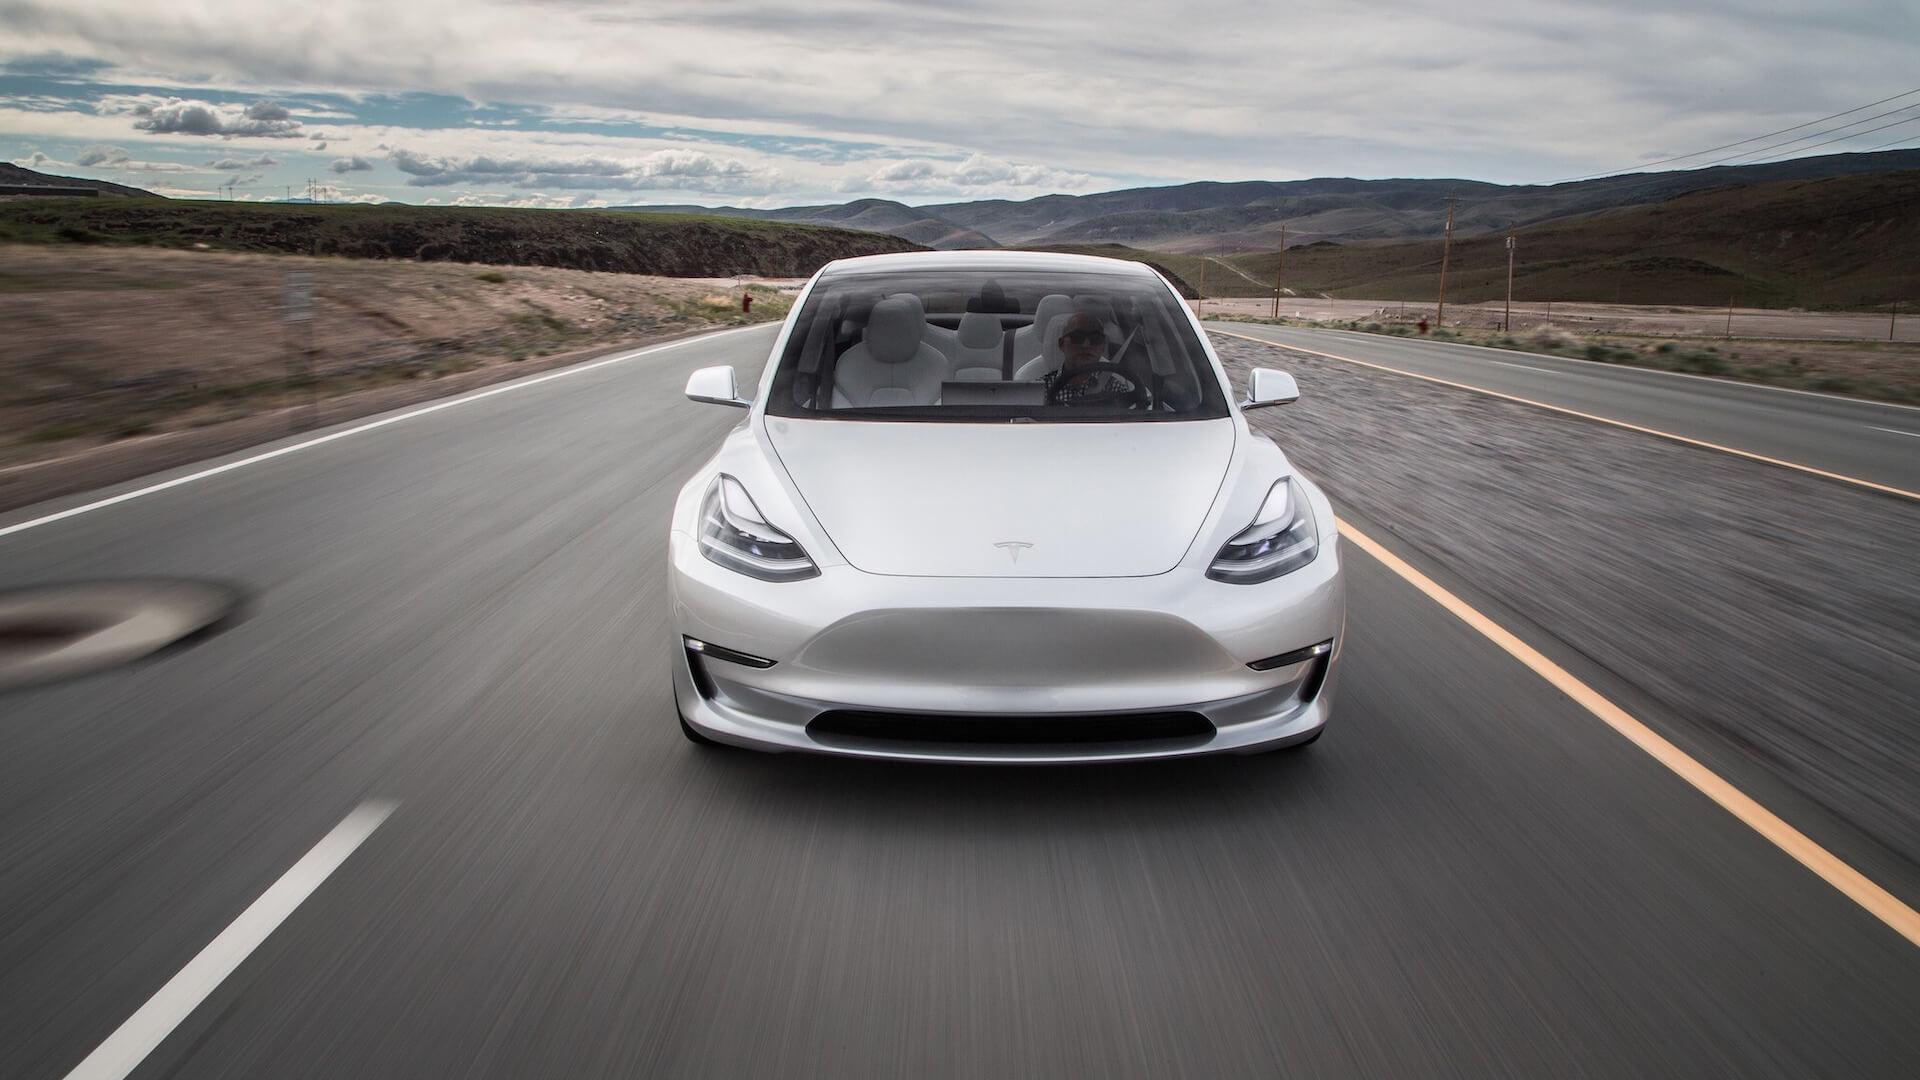 Картинки по запросу Tesla Model 3 спереди